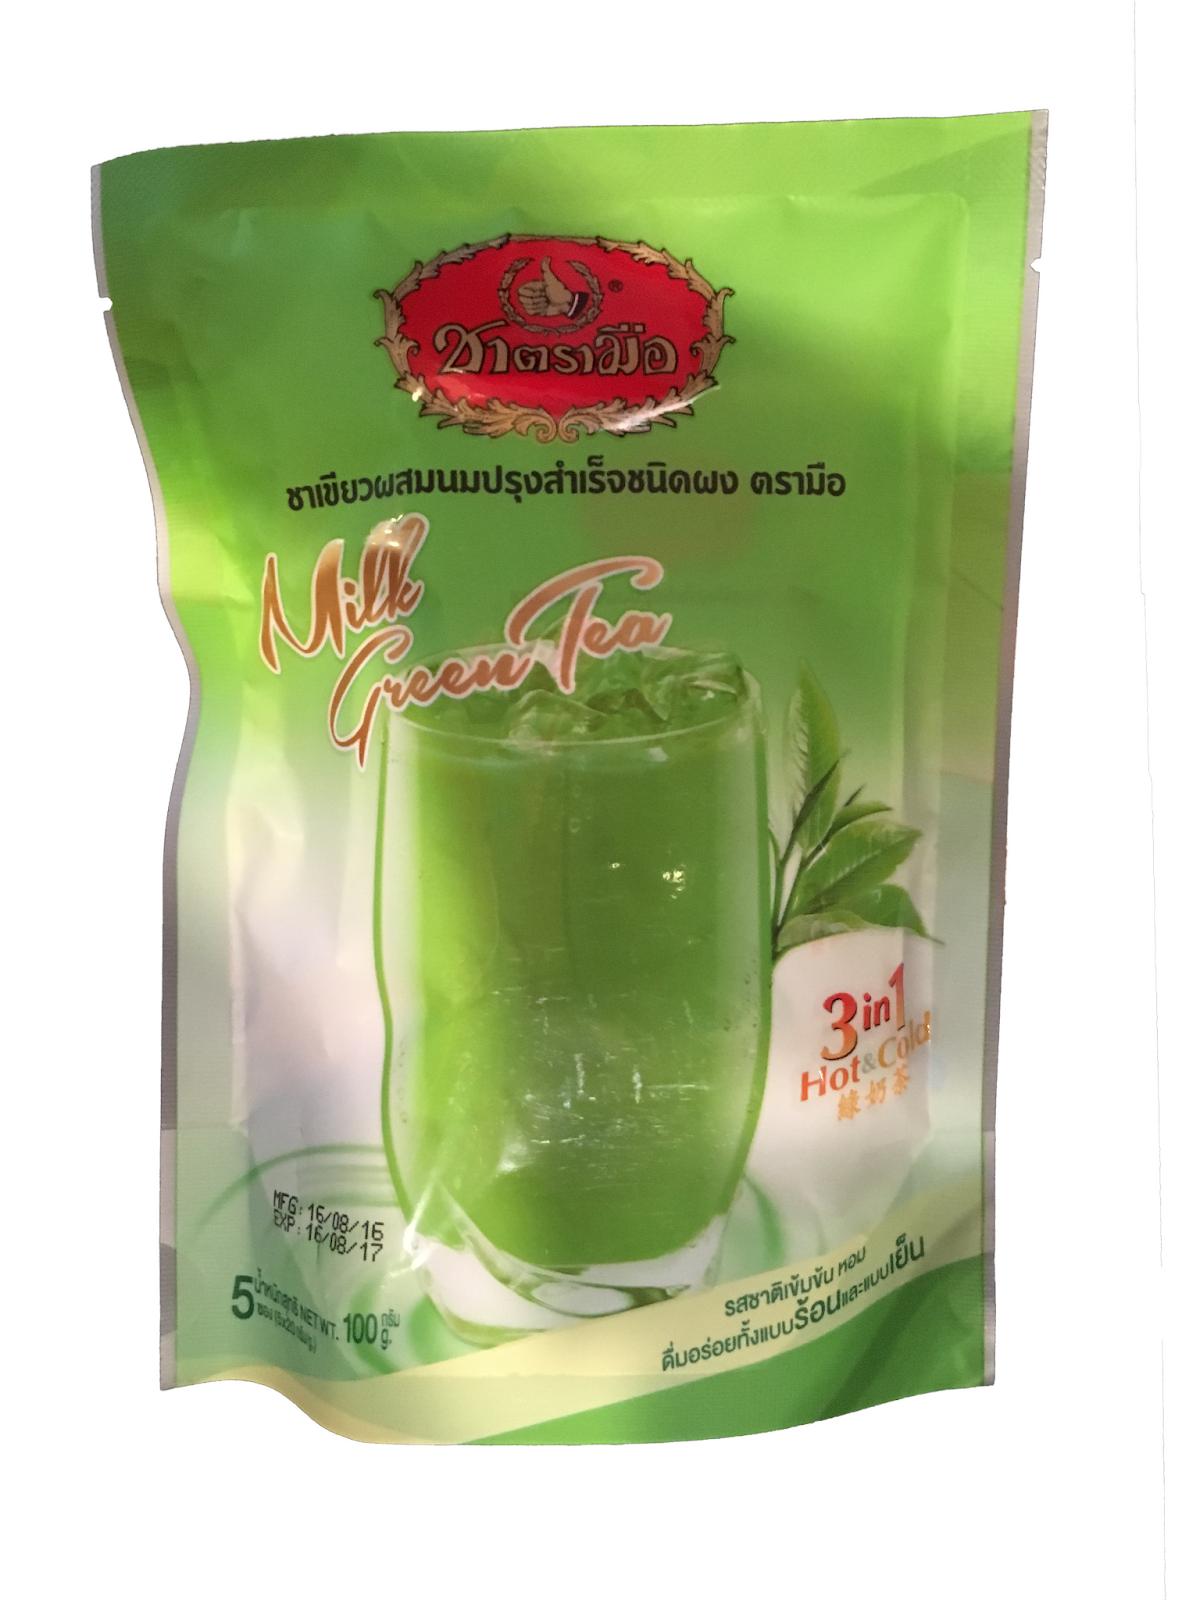 Thai Tea Number One Brand Chatramue Plastik Tenteng Cup Kantong Gelas Harga Green Instant Powder 3 In 1